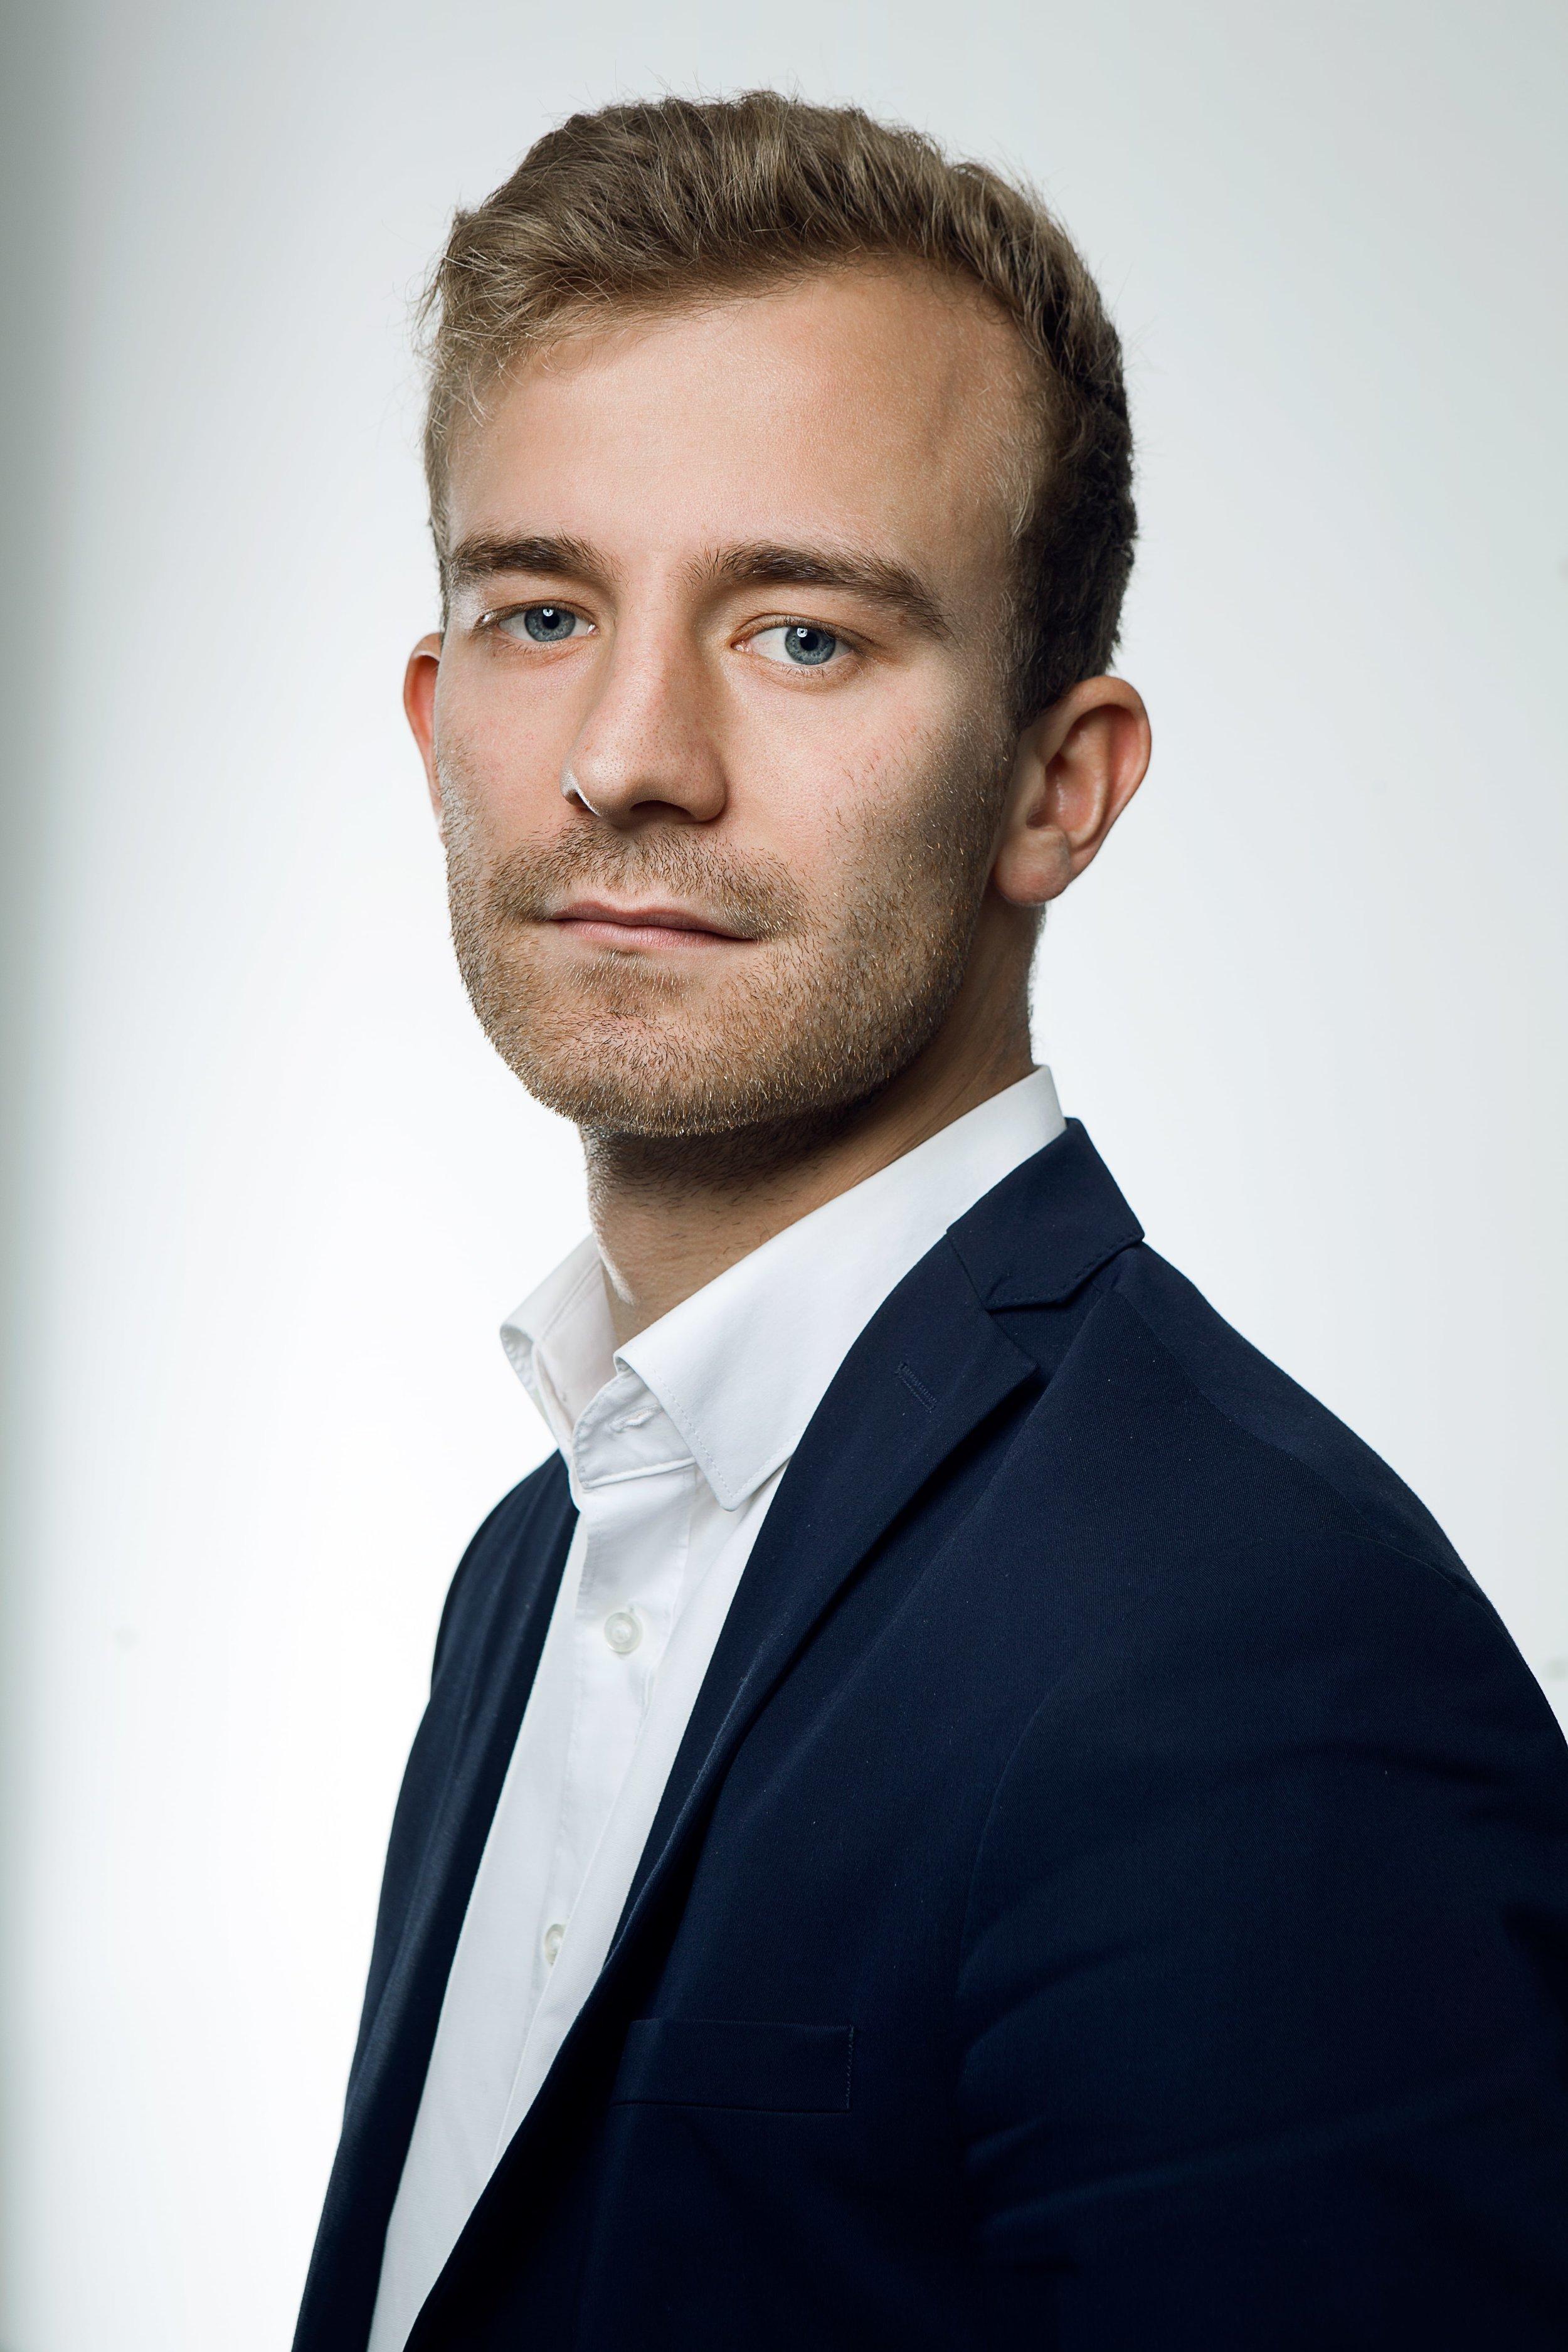 Jan Winkhold